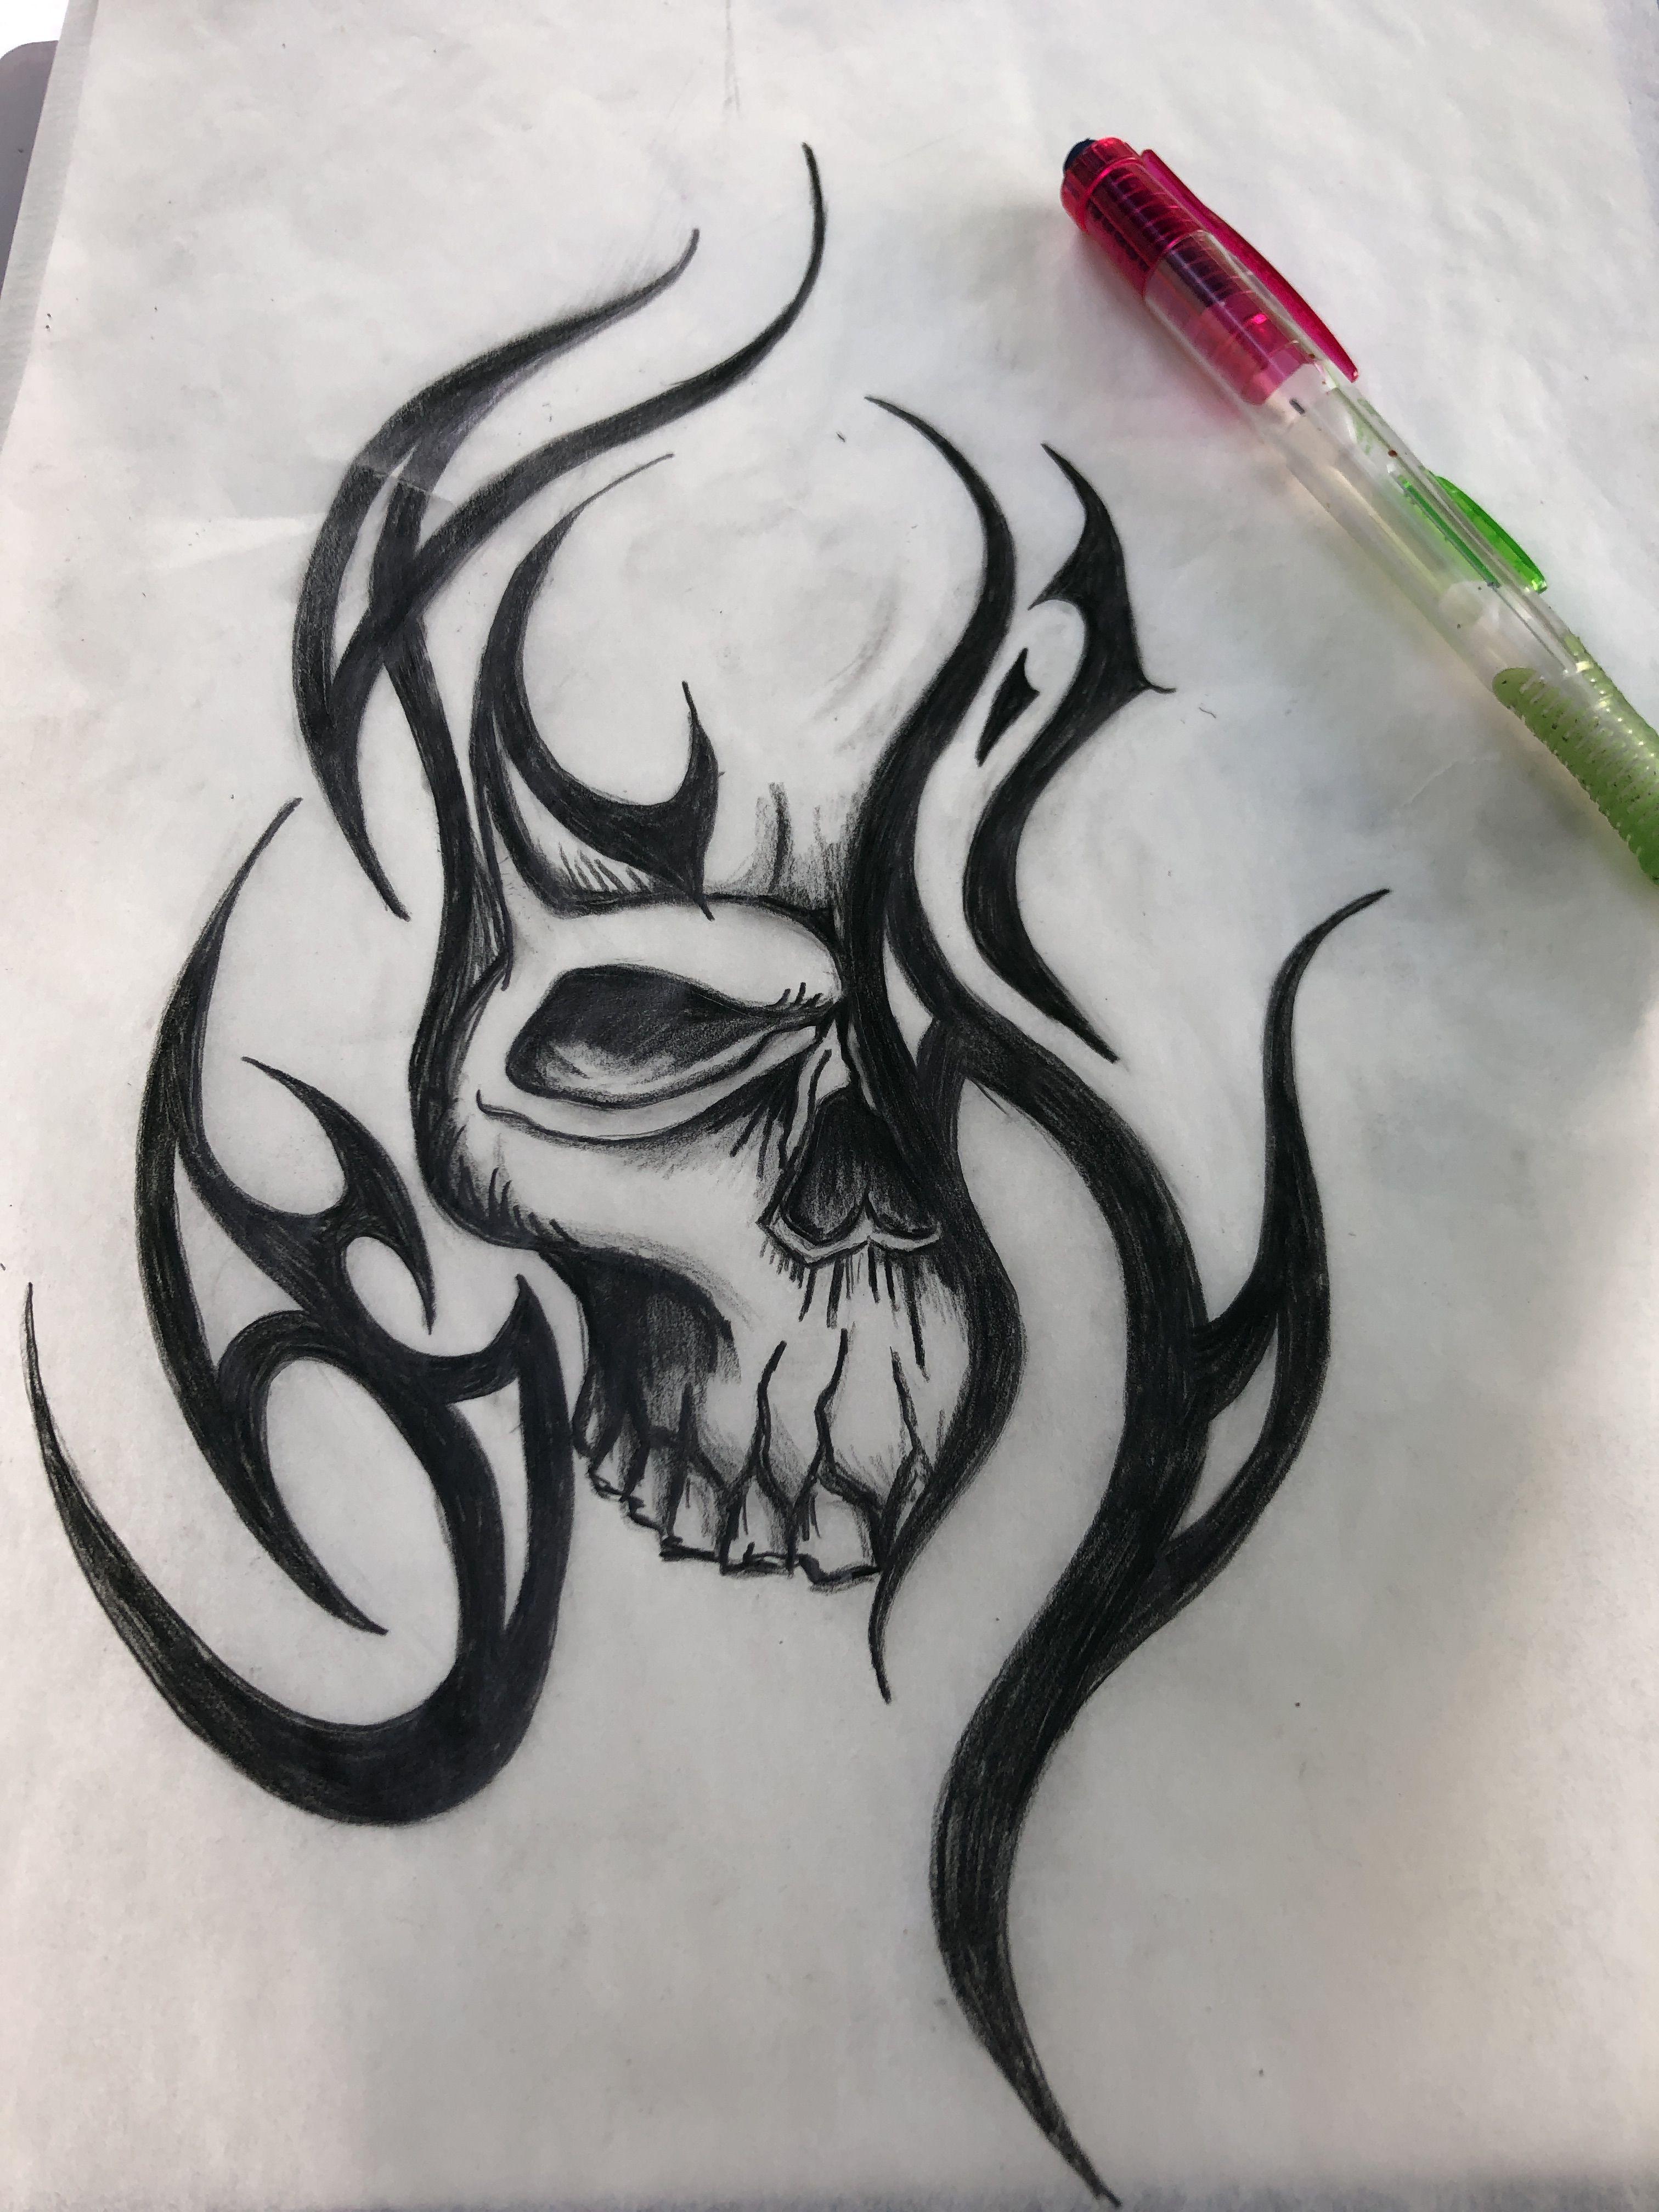 Pin By Terry Wilbur On Class In 2020 Tribal Tattoos Tribal Skull Skulls Drawing